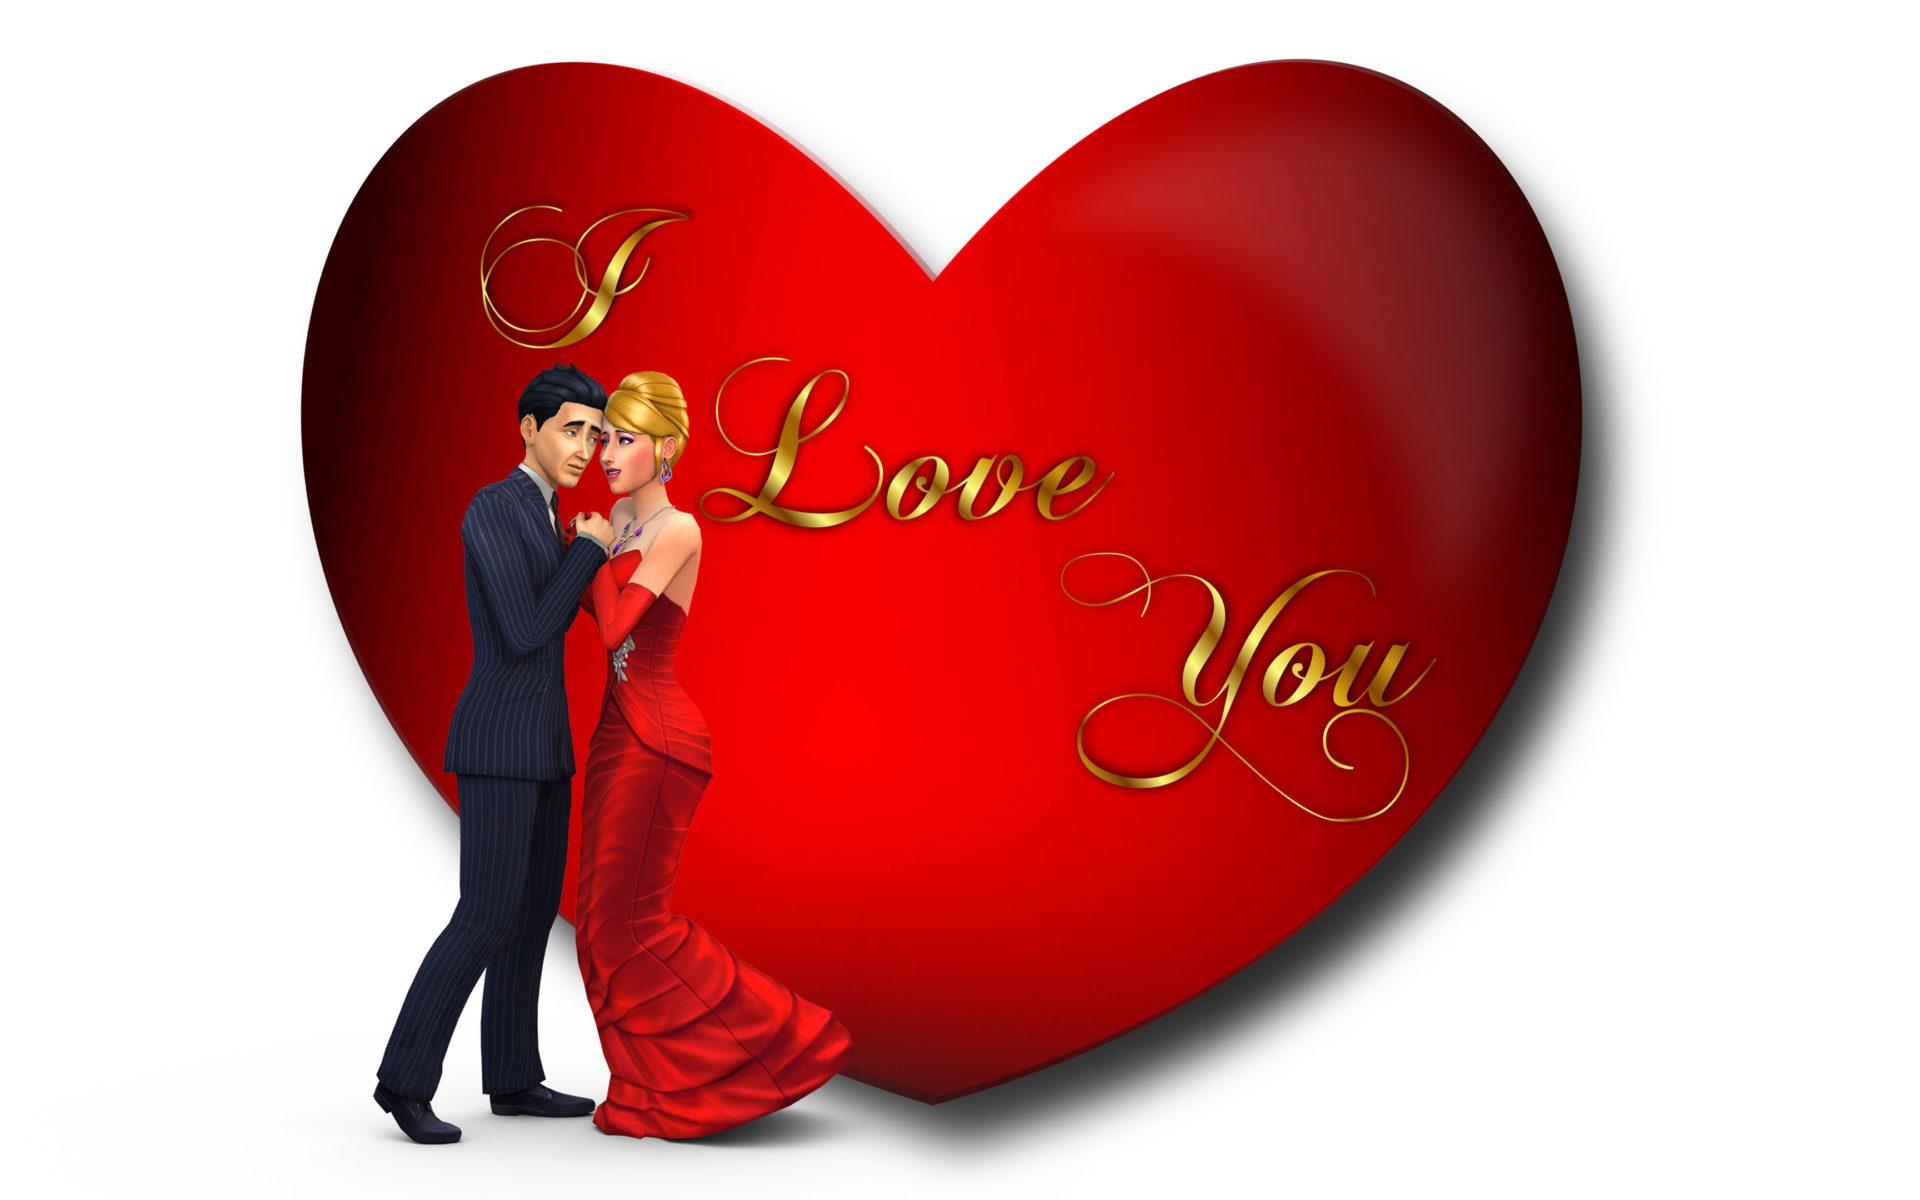 Love Wallpaper Valentines Day - HD Wallpaper